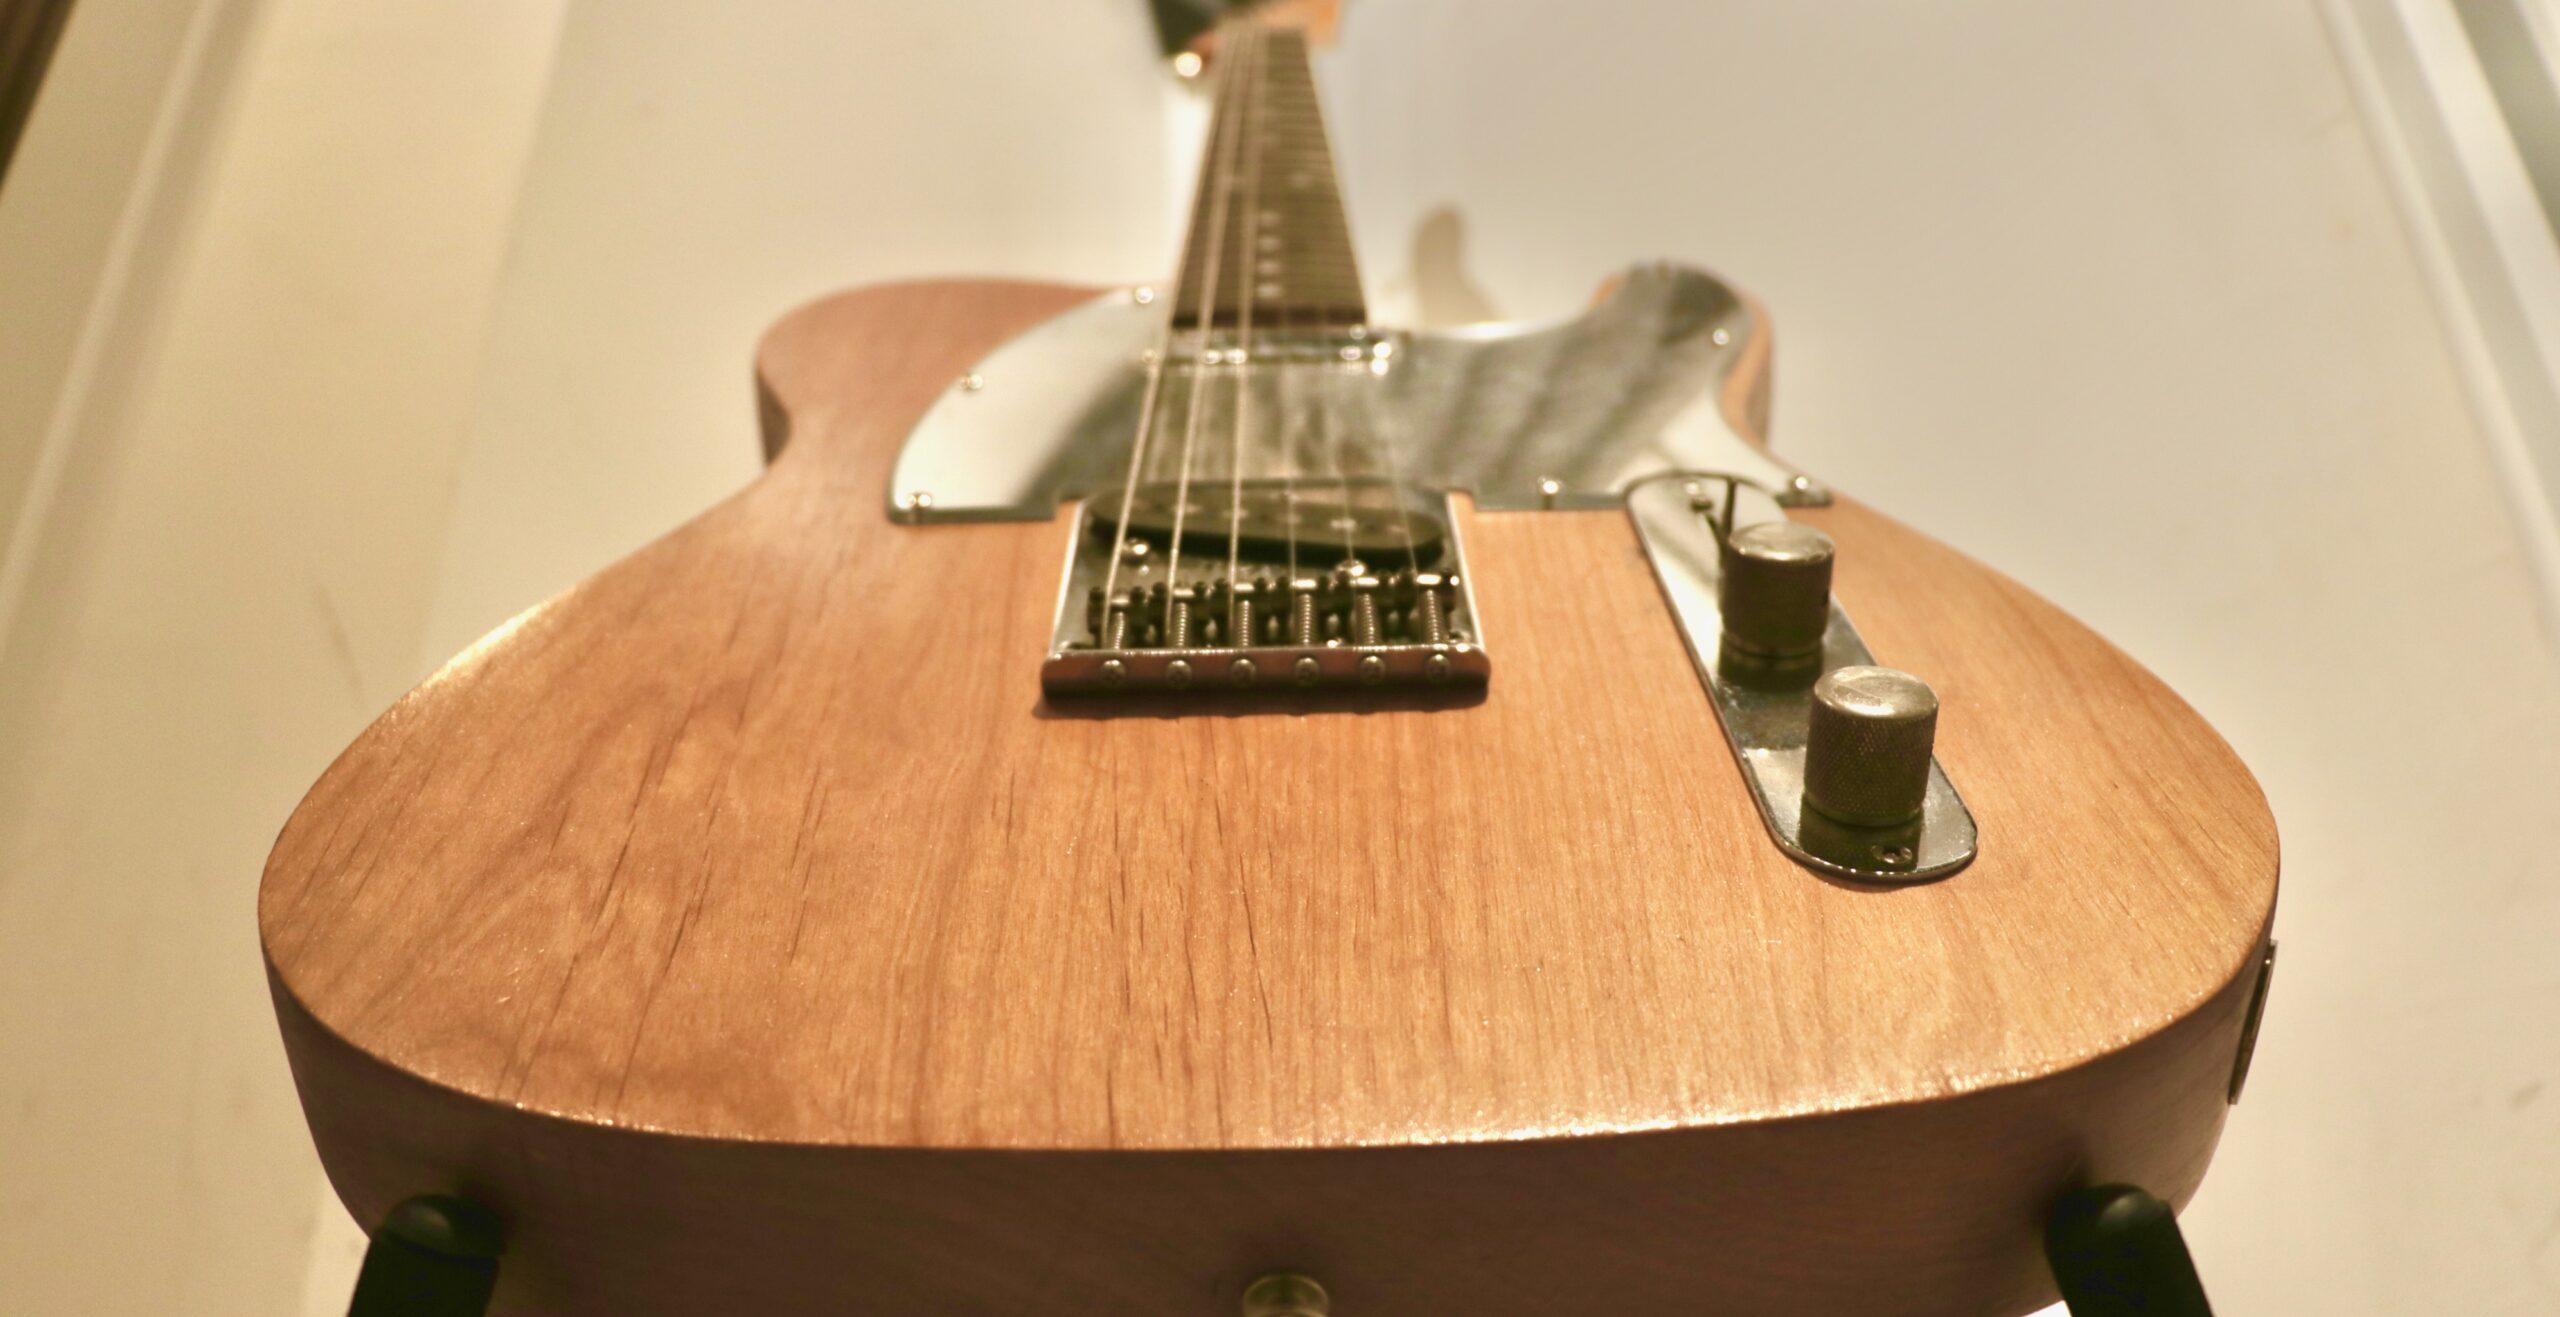 Fender Telecaster - 12 Tree Studios